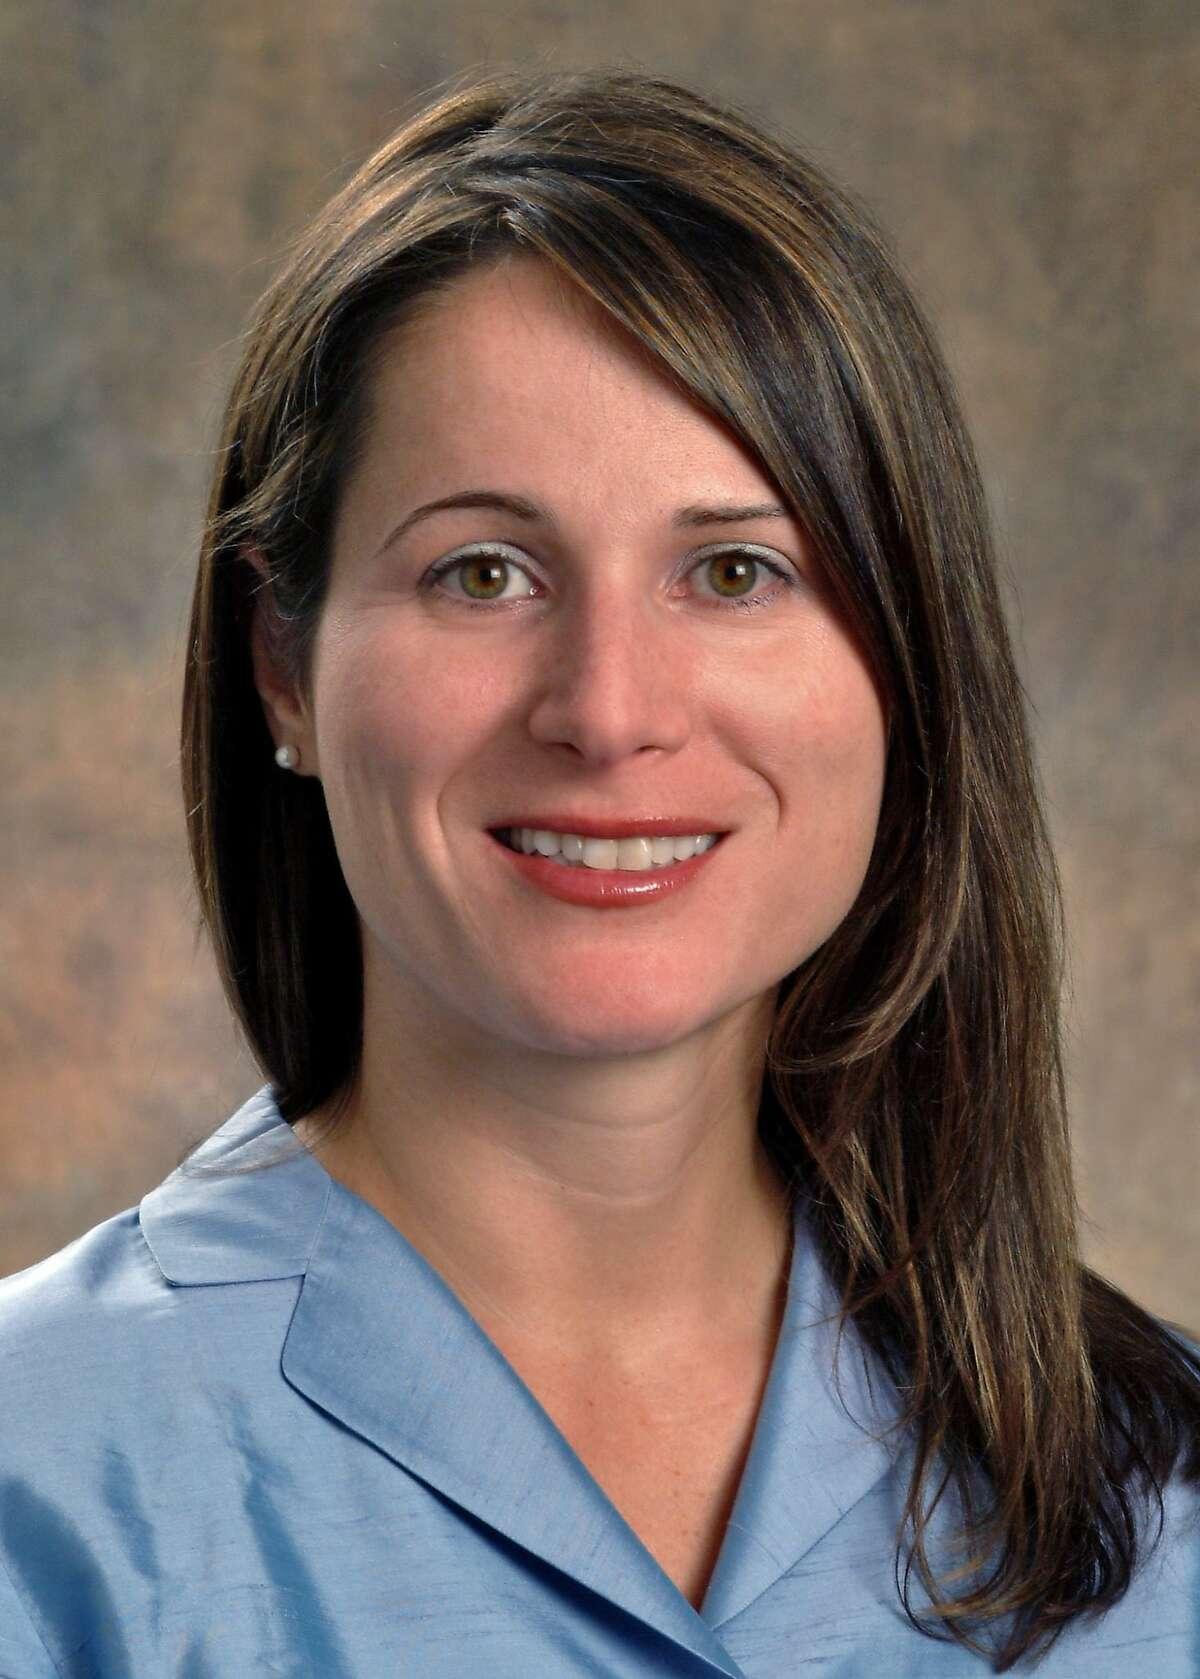 Dr. Michelle A. Malcolmson